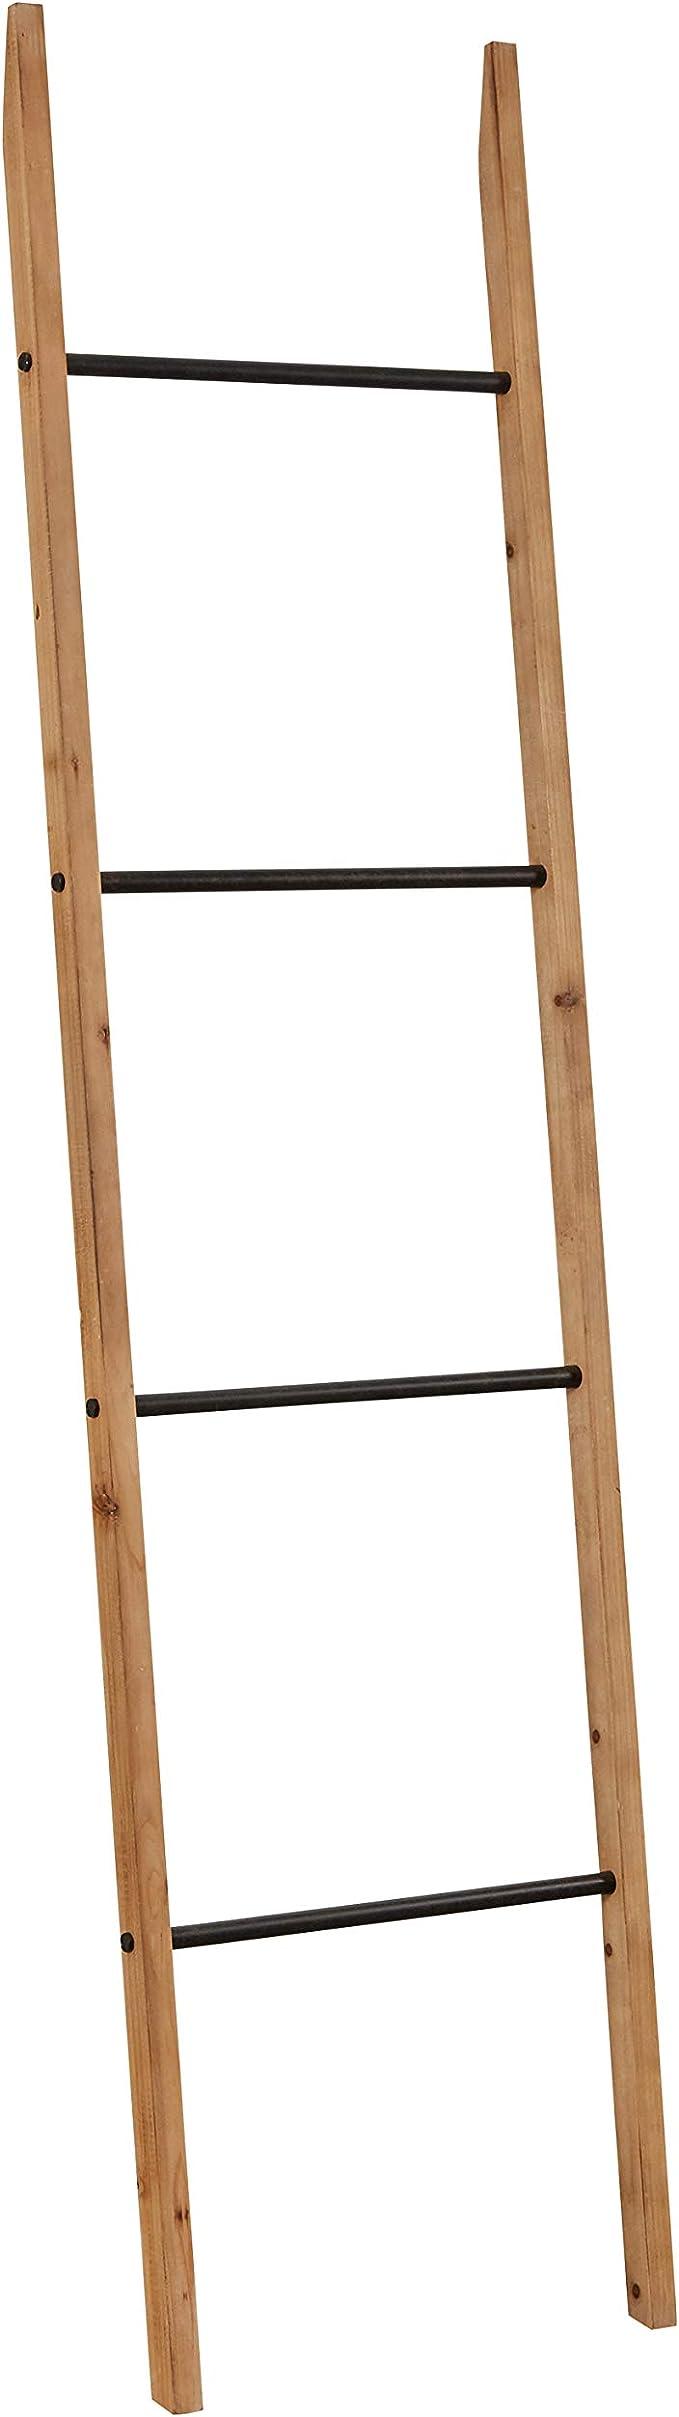 Amazon Brand – Rivet Contemporary Fir Decorative Blanket Ladder with Iron  Rungs   20.20